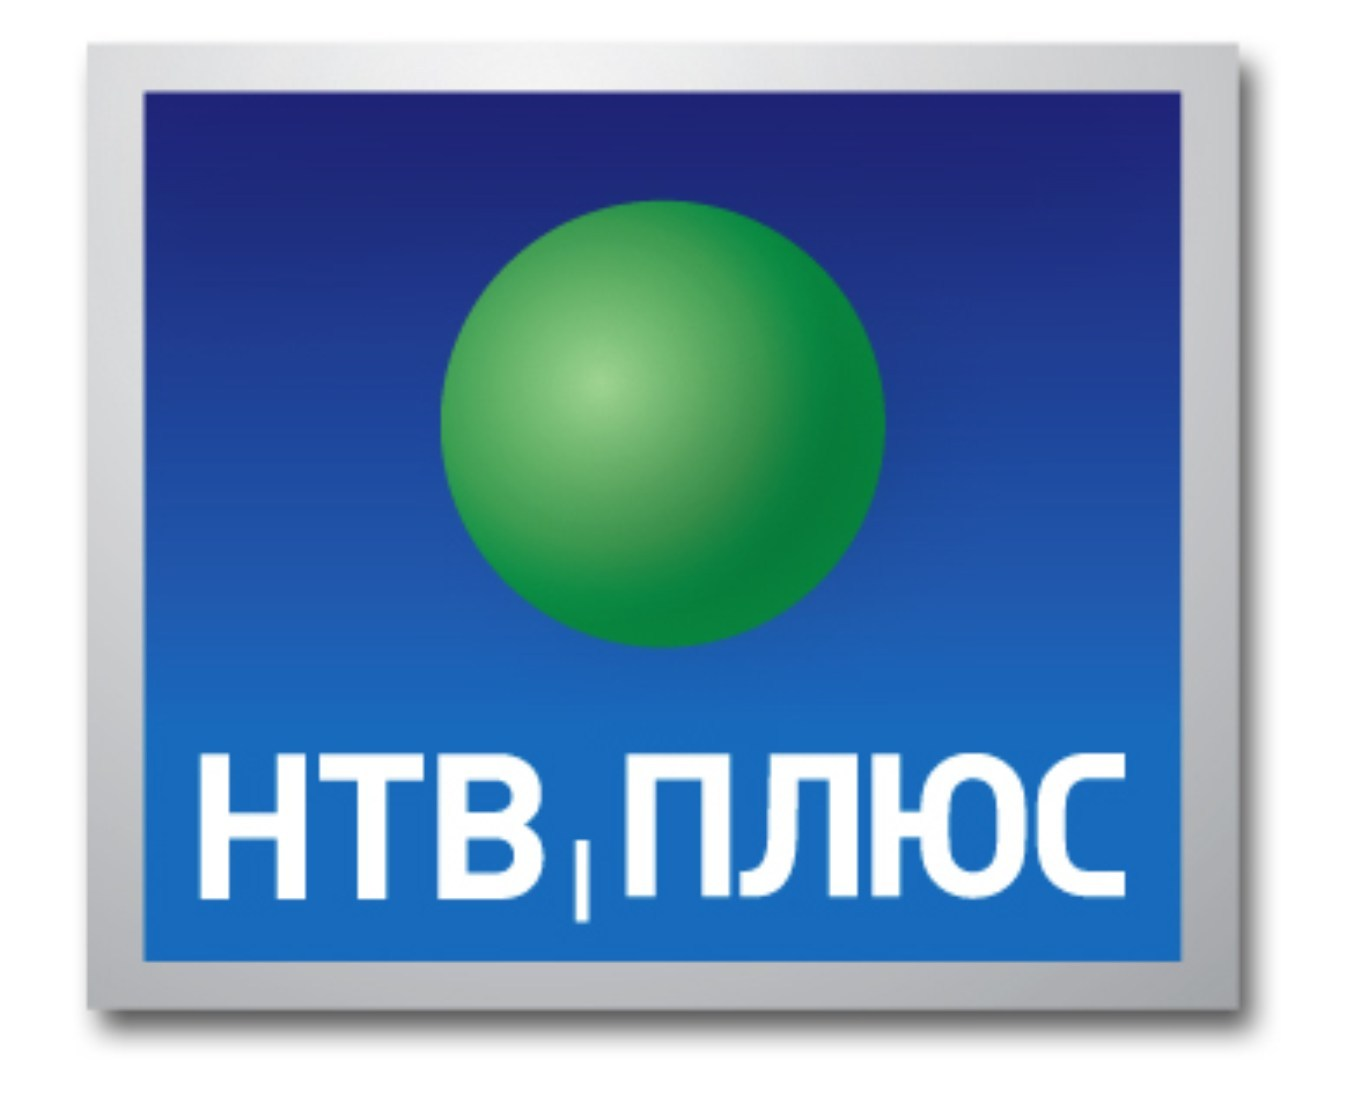 Спутниковые каналы телеканалы нтв онлайн бесплатно 4 фотография